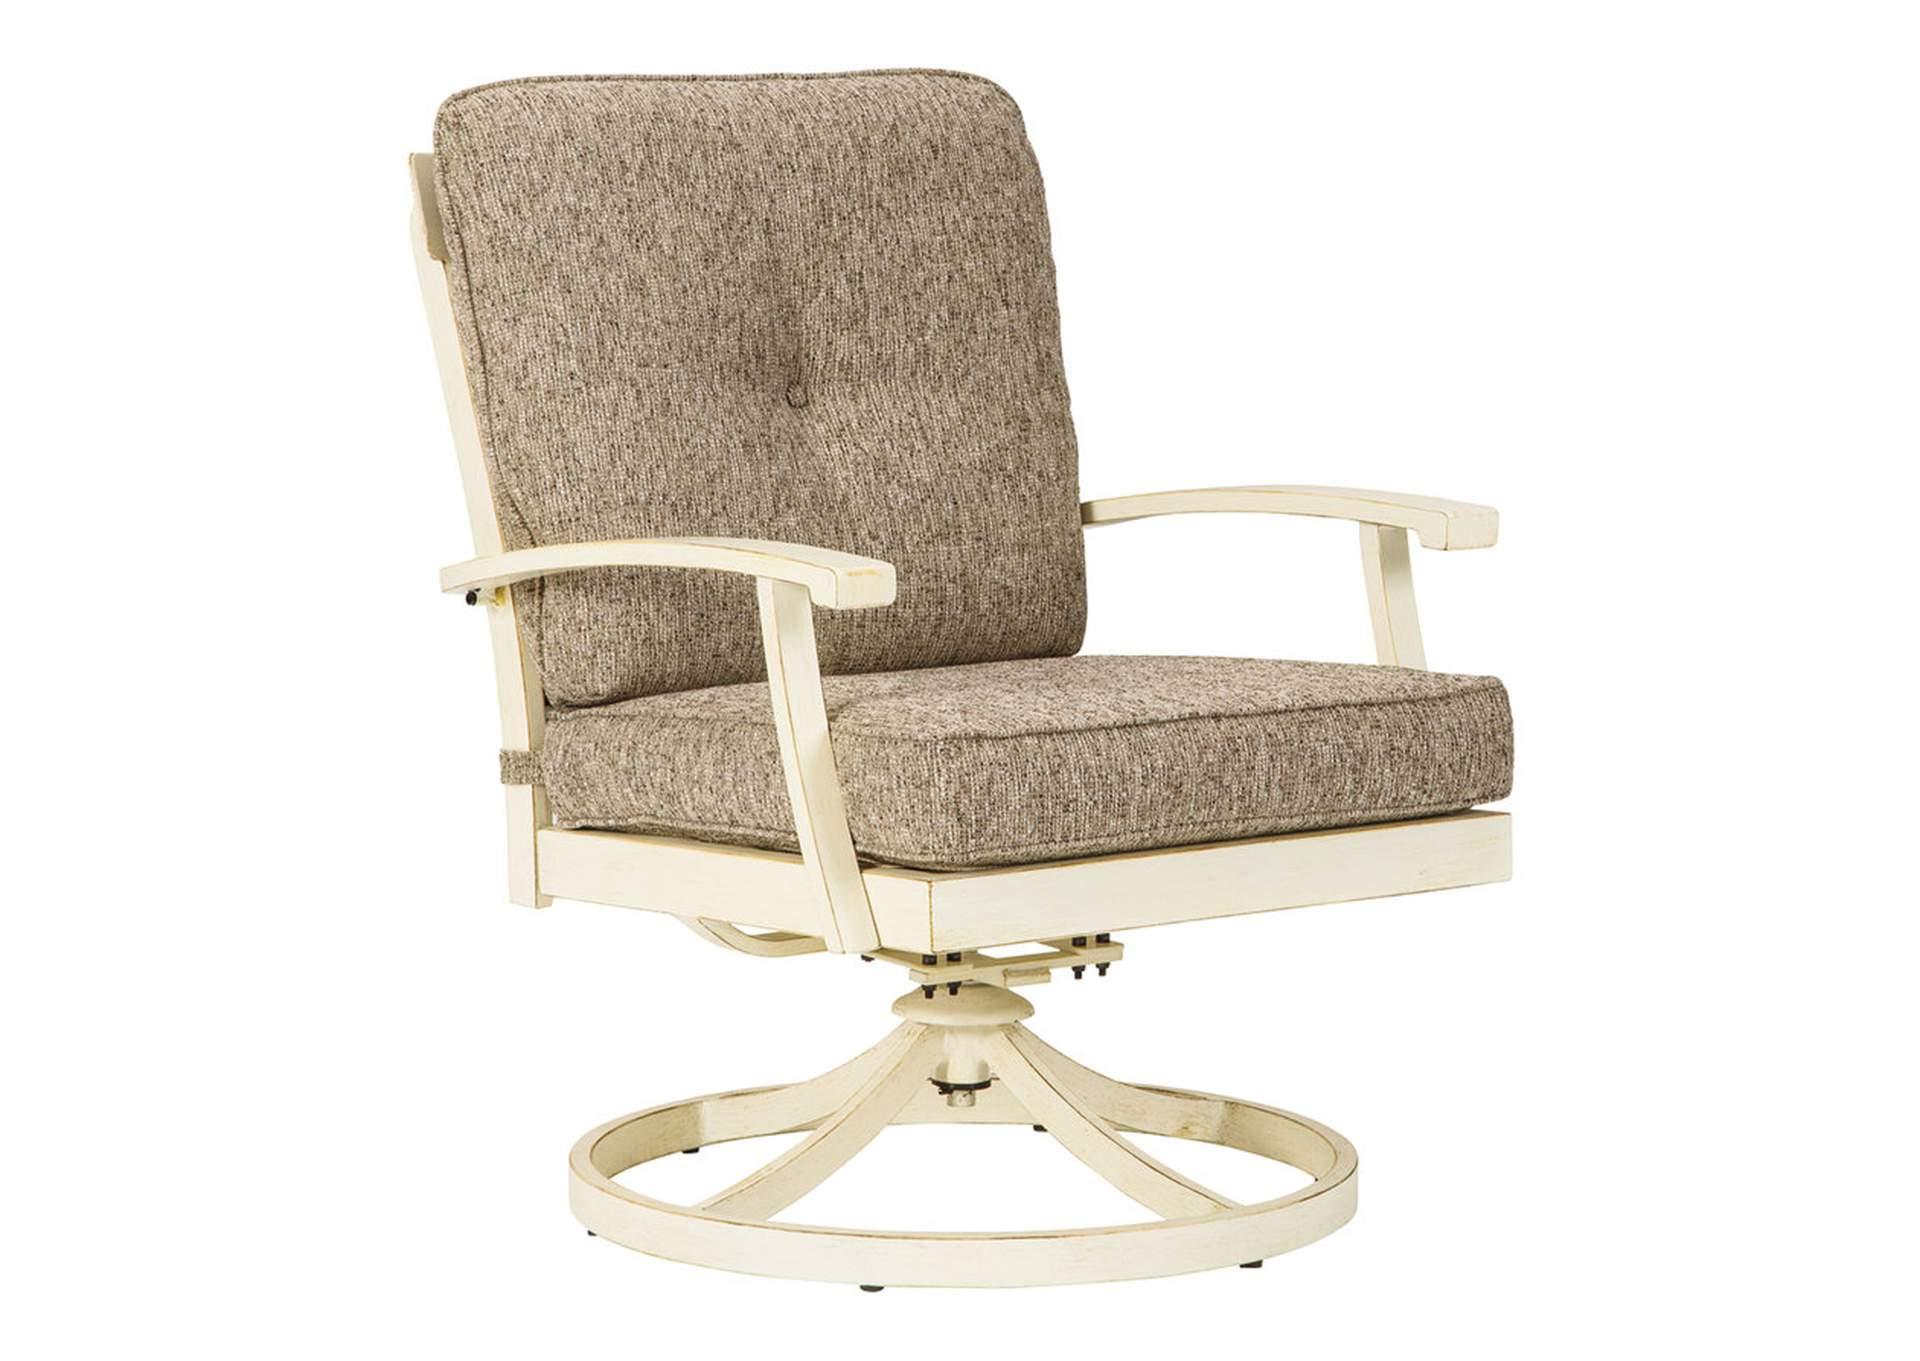 Preston Bay Antique White Swivel Lounge with Cushion (Set of 2)